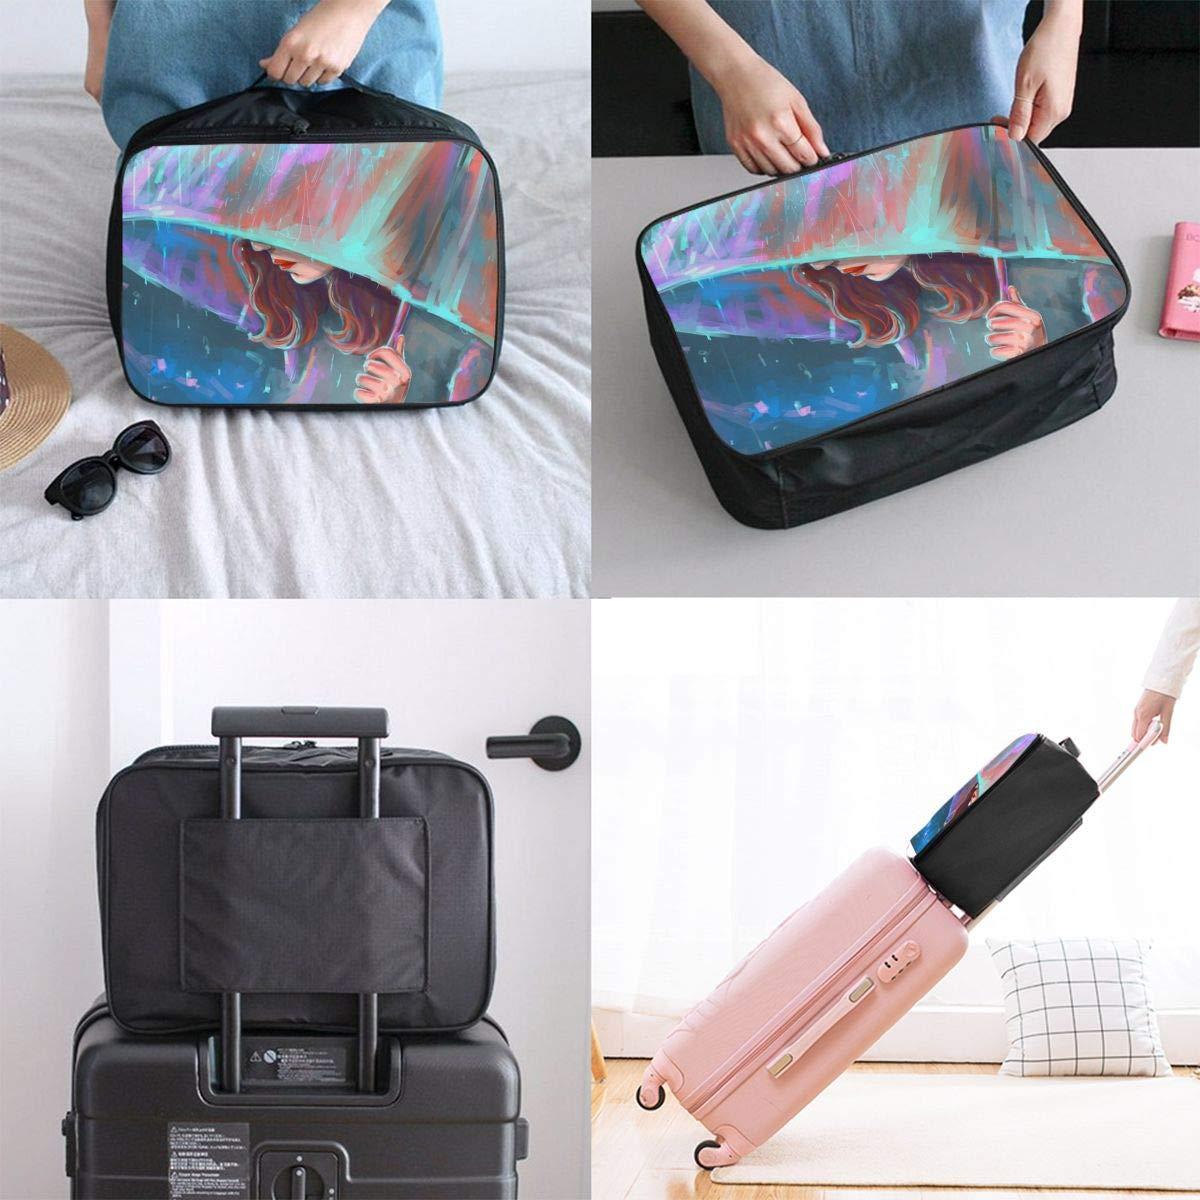 Travel Luggage Duffle Bag Lightweight Portable Handbag Umbrella Girl Pattern Large Capacity Waterproof Foldable Storage Tote